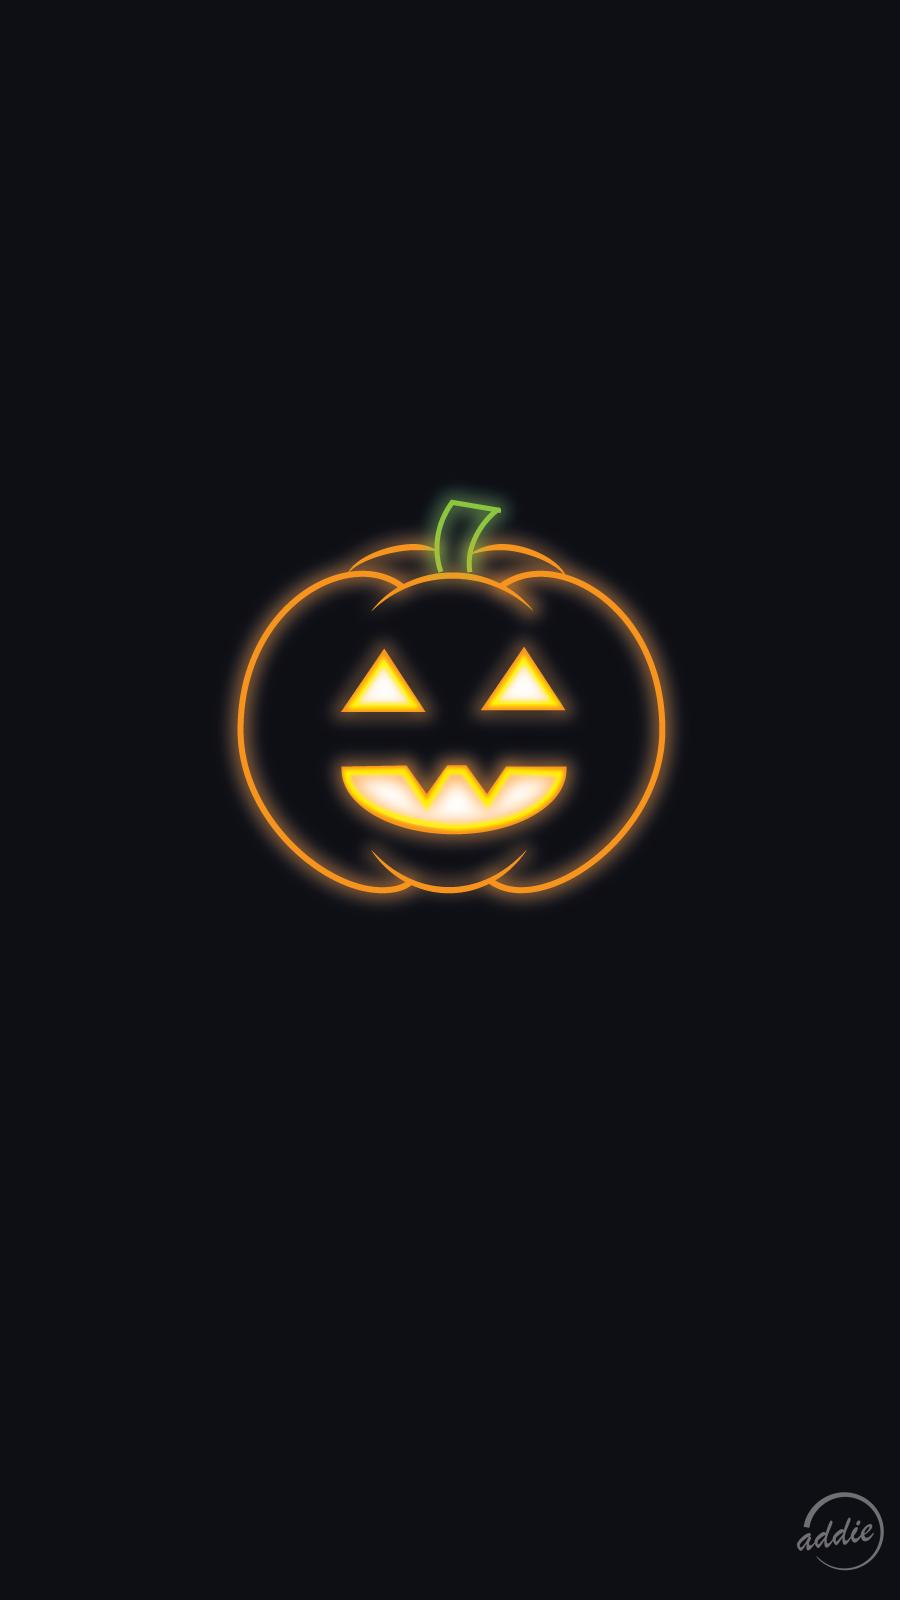 Halloween Neon Jack o' Lantern Phone Wallpaper